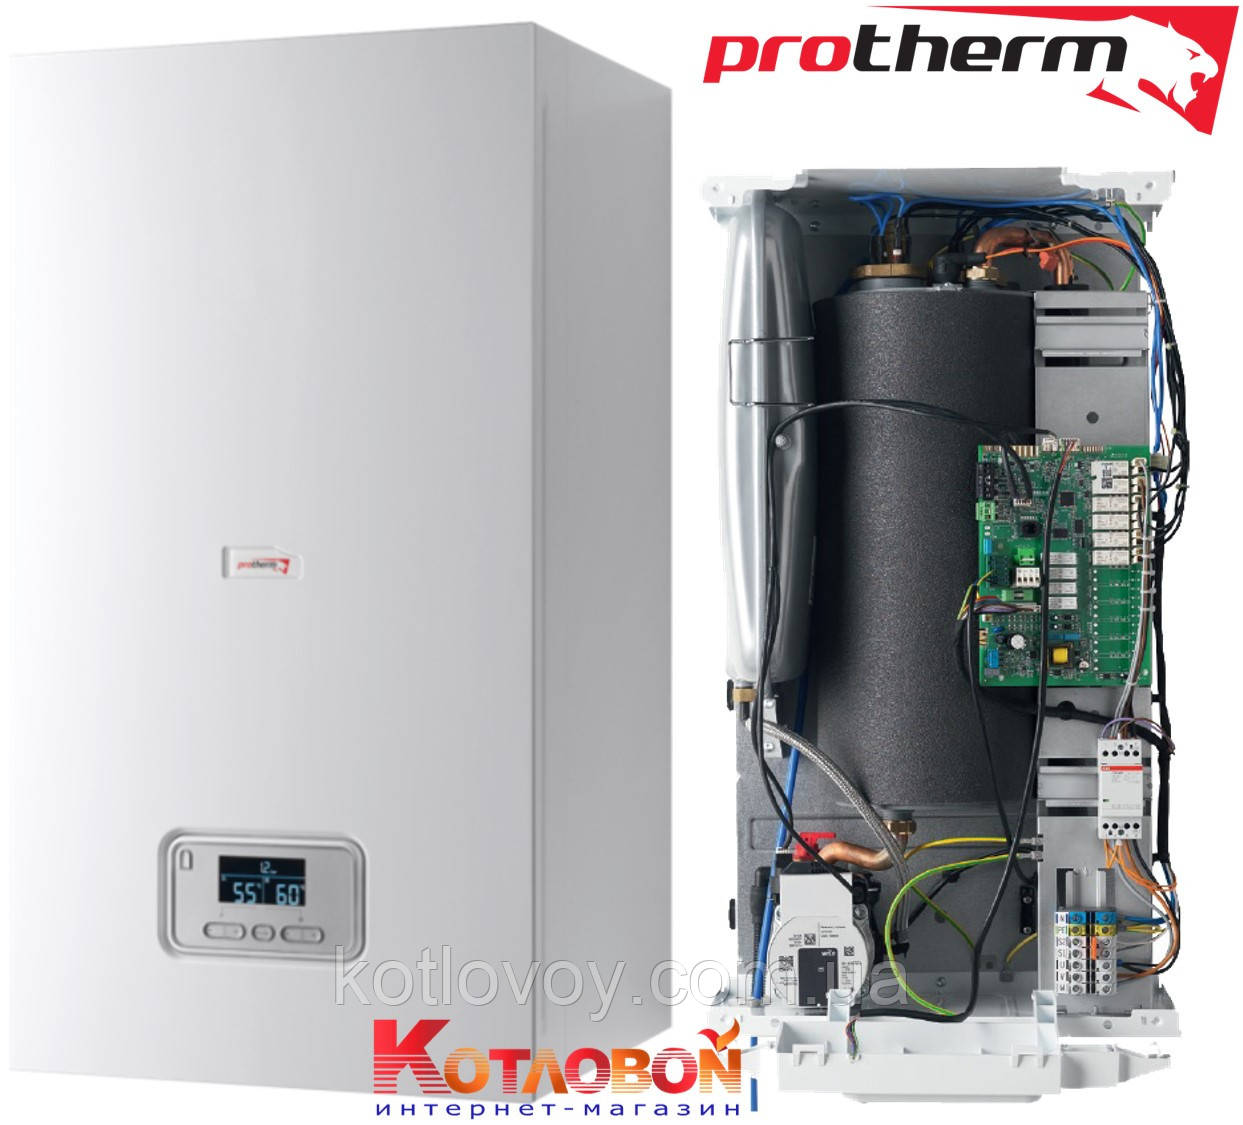 Электрический котел Protherm (Ray) Скат